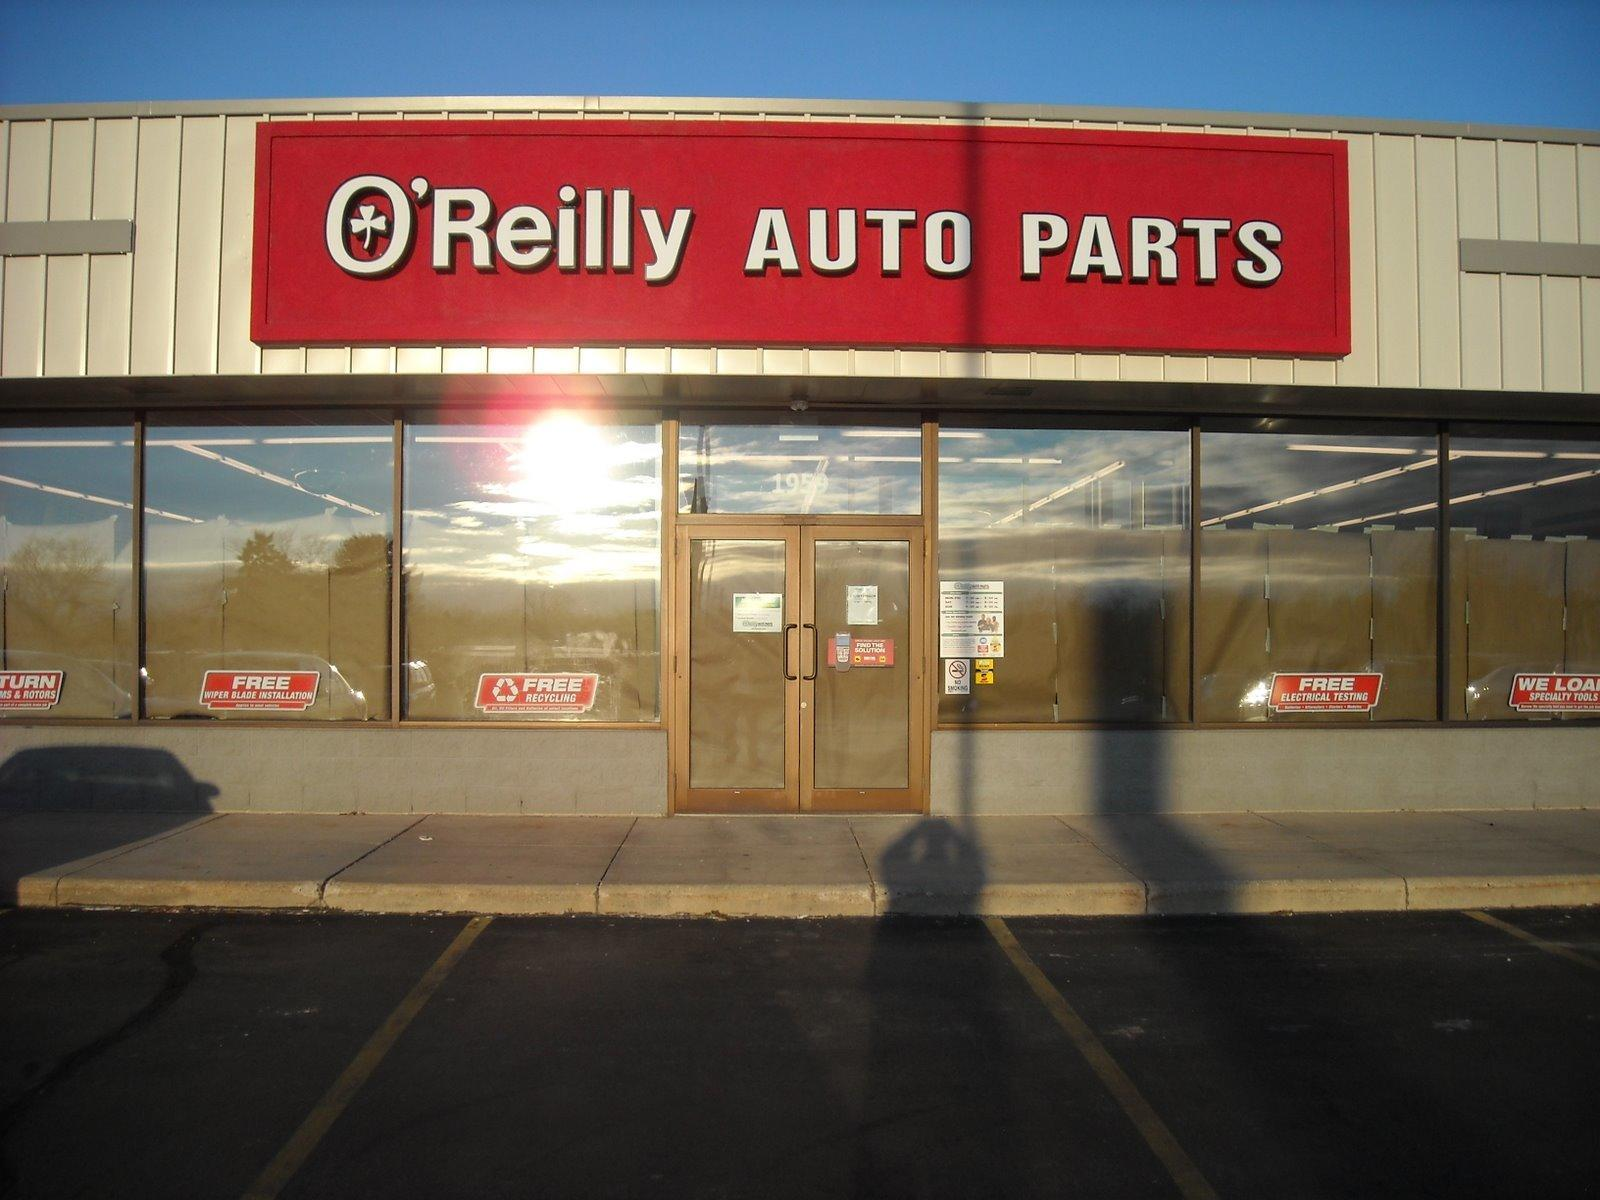 o'reilly auto parts - photo #40